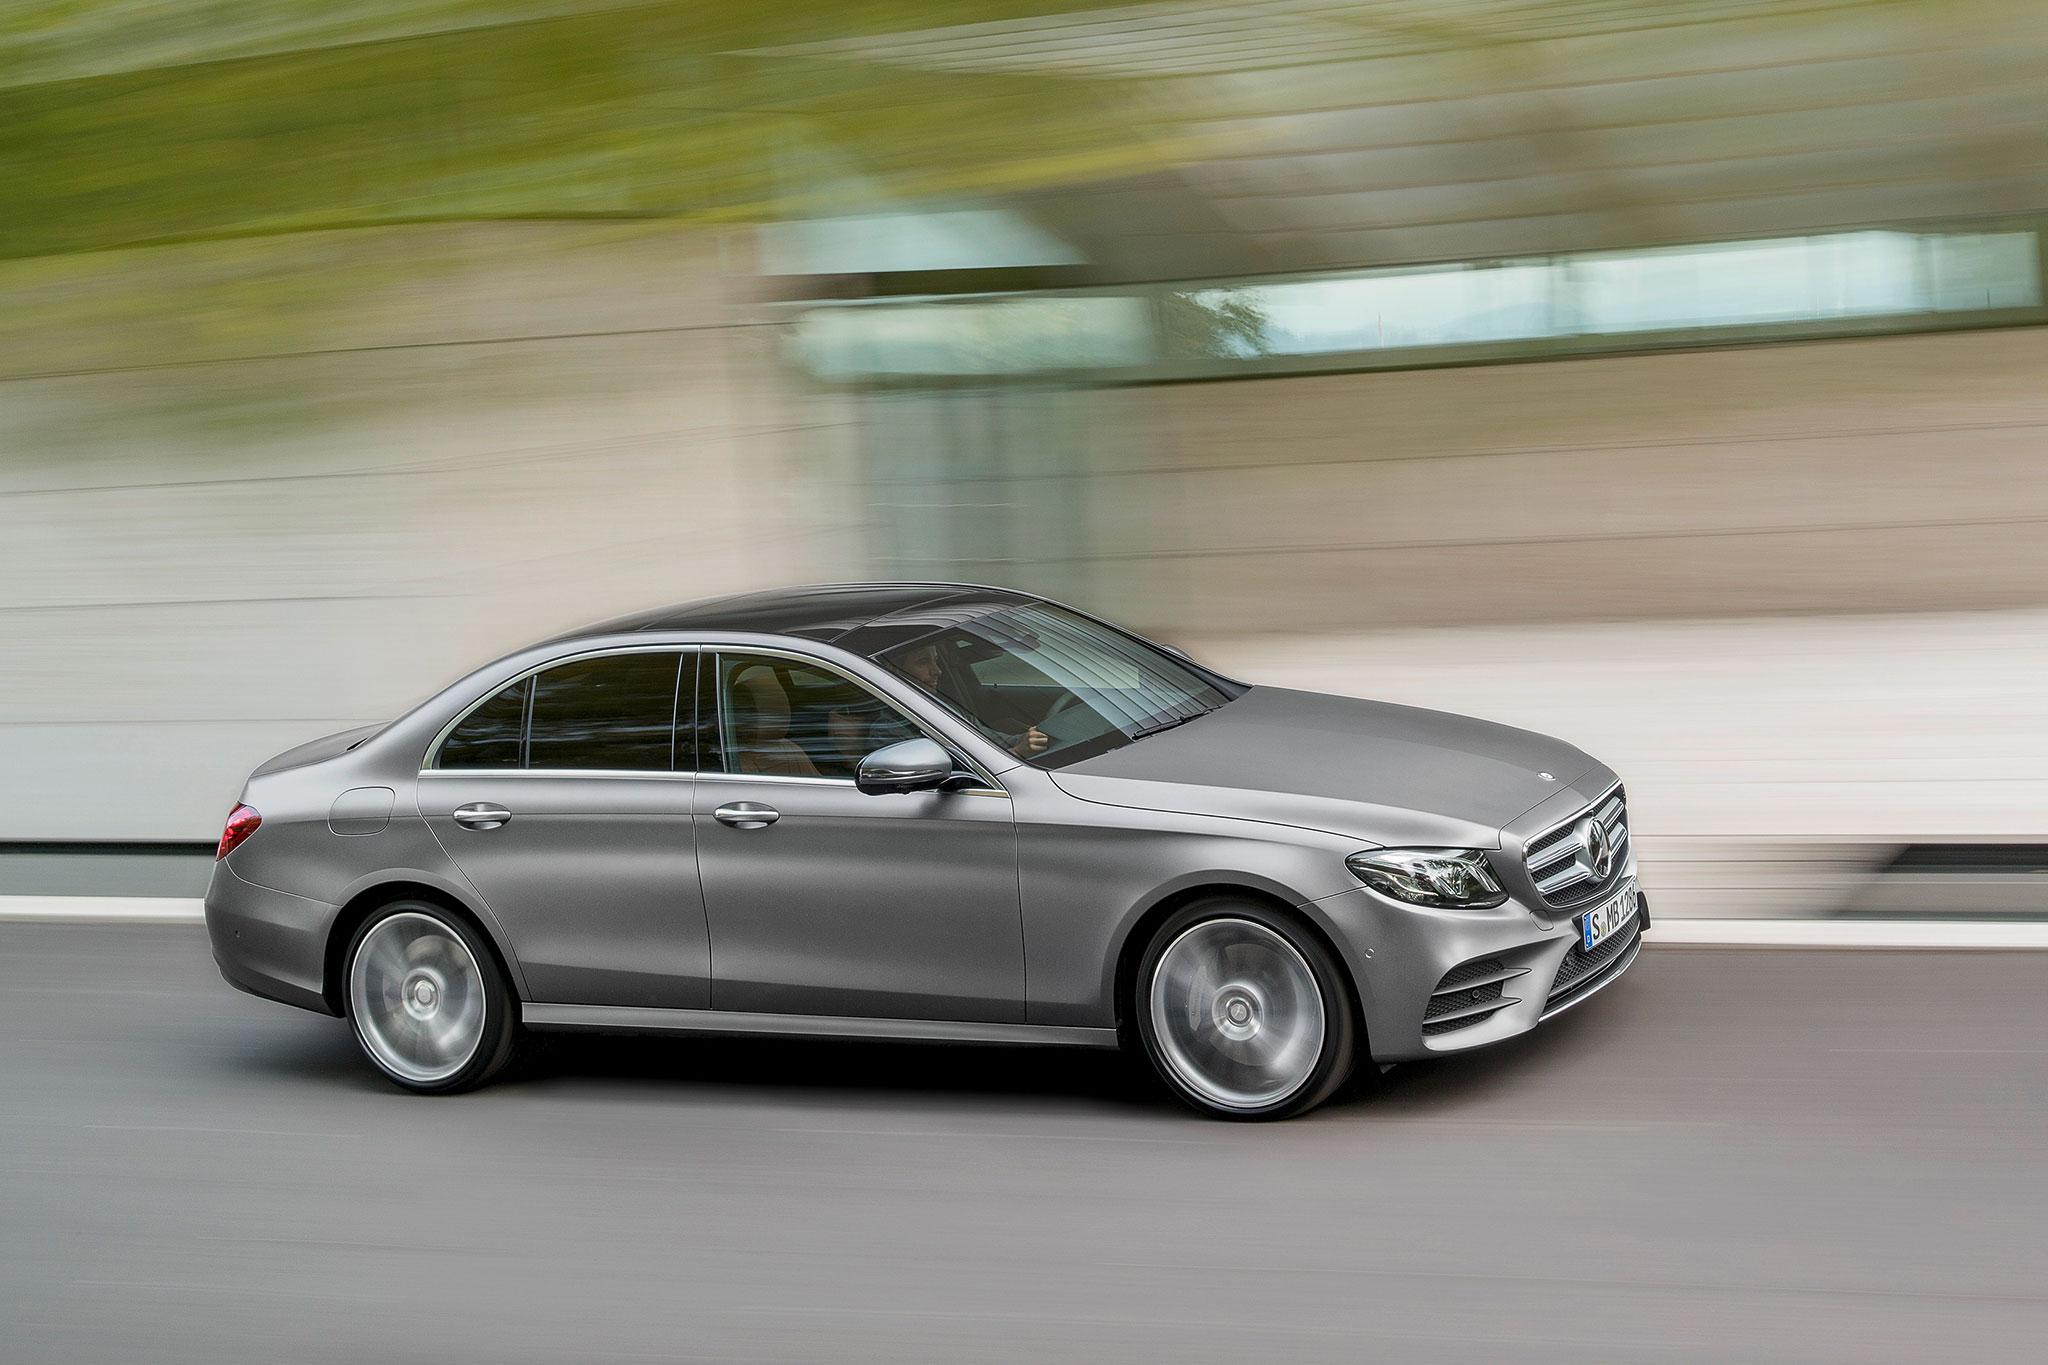 https://st.automobilemag.com/uploads/sites/11/2016/01/2017-Mercedes-Benz-E-Class-front-three-quarter-in-motion-04.jpg